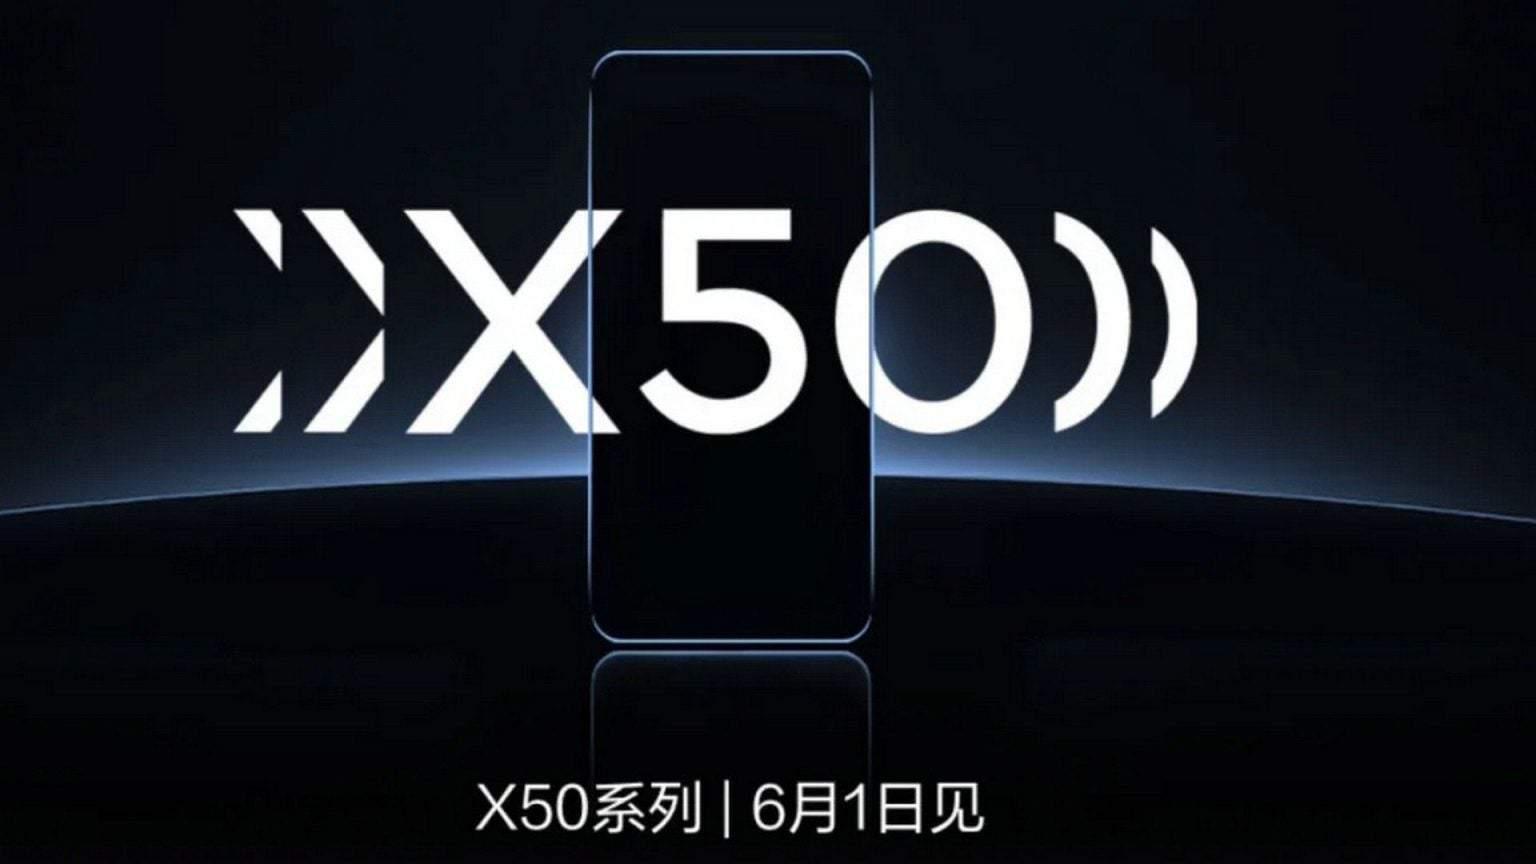 VIVO X50 5G将于6月1日正式上市